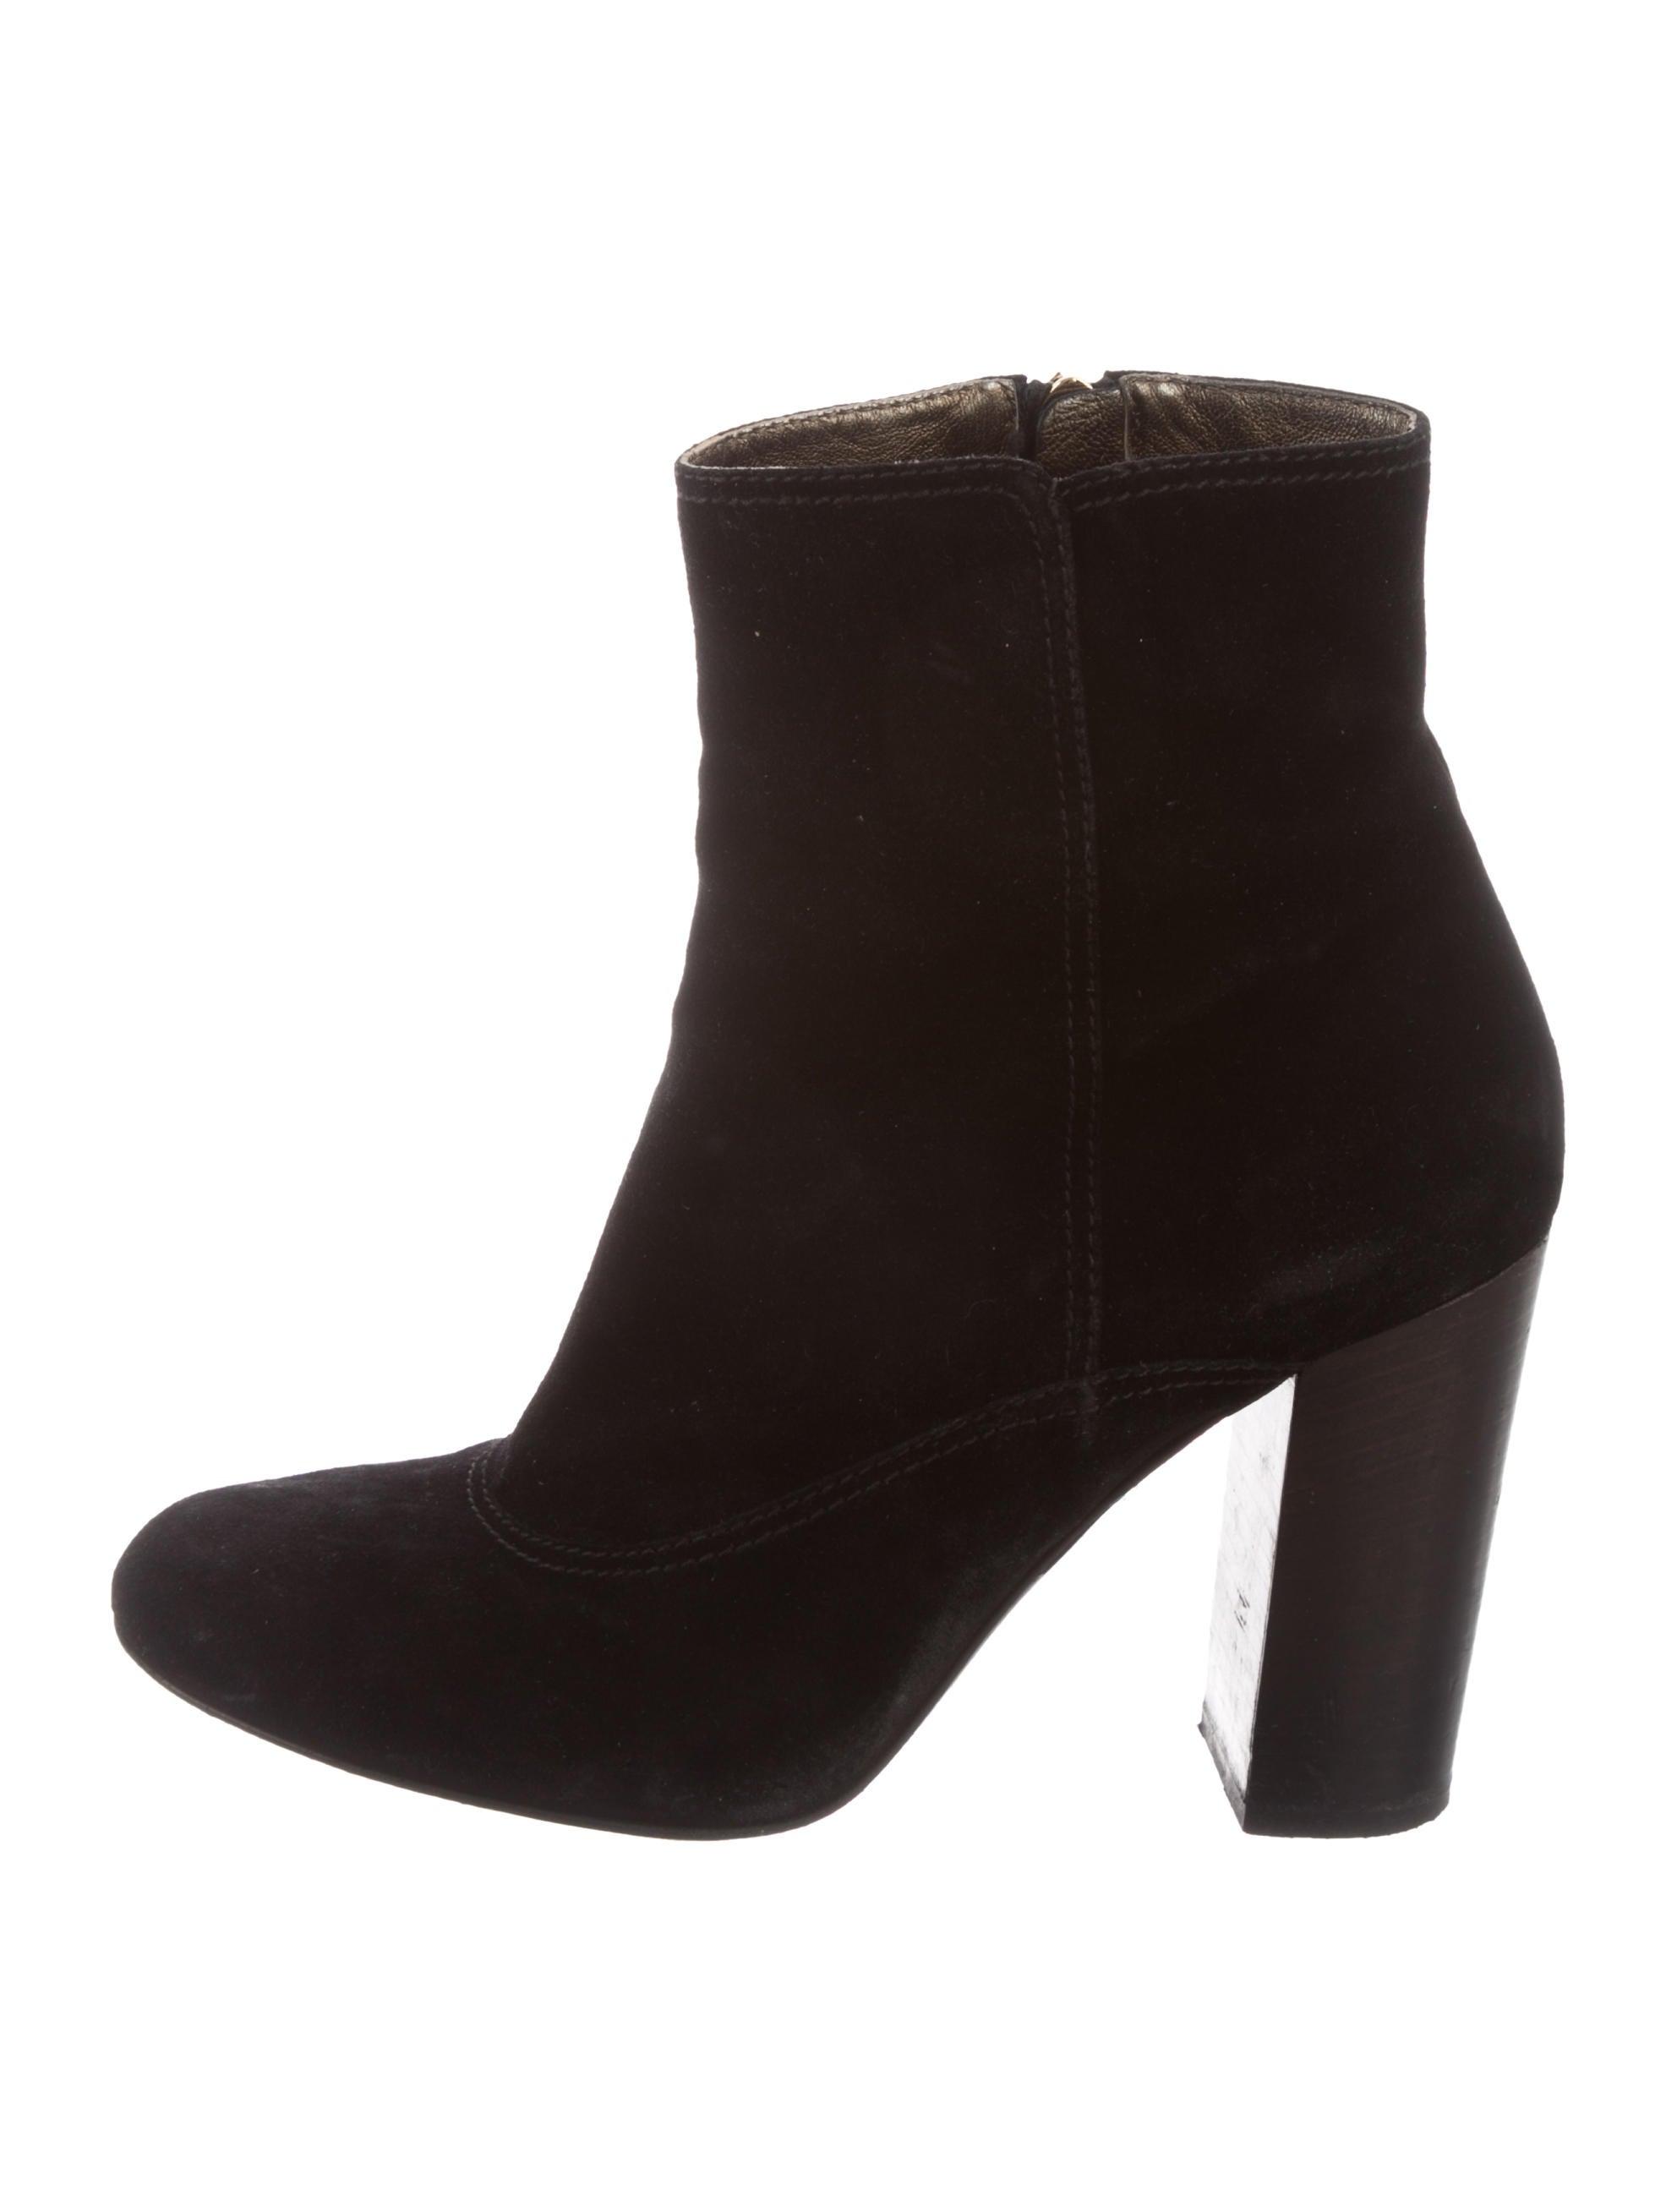 sale limited edition visit cheap online Lanvin Round-Toe Suede Ankle Boots sale visit new hot sale sale online YOq5zRXLCa